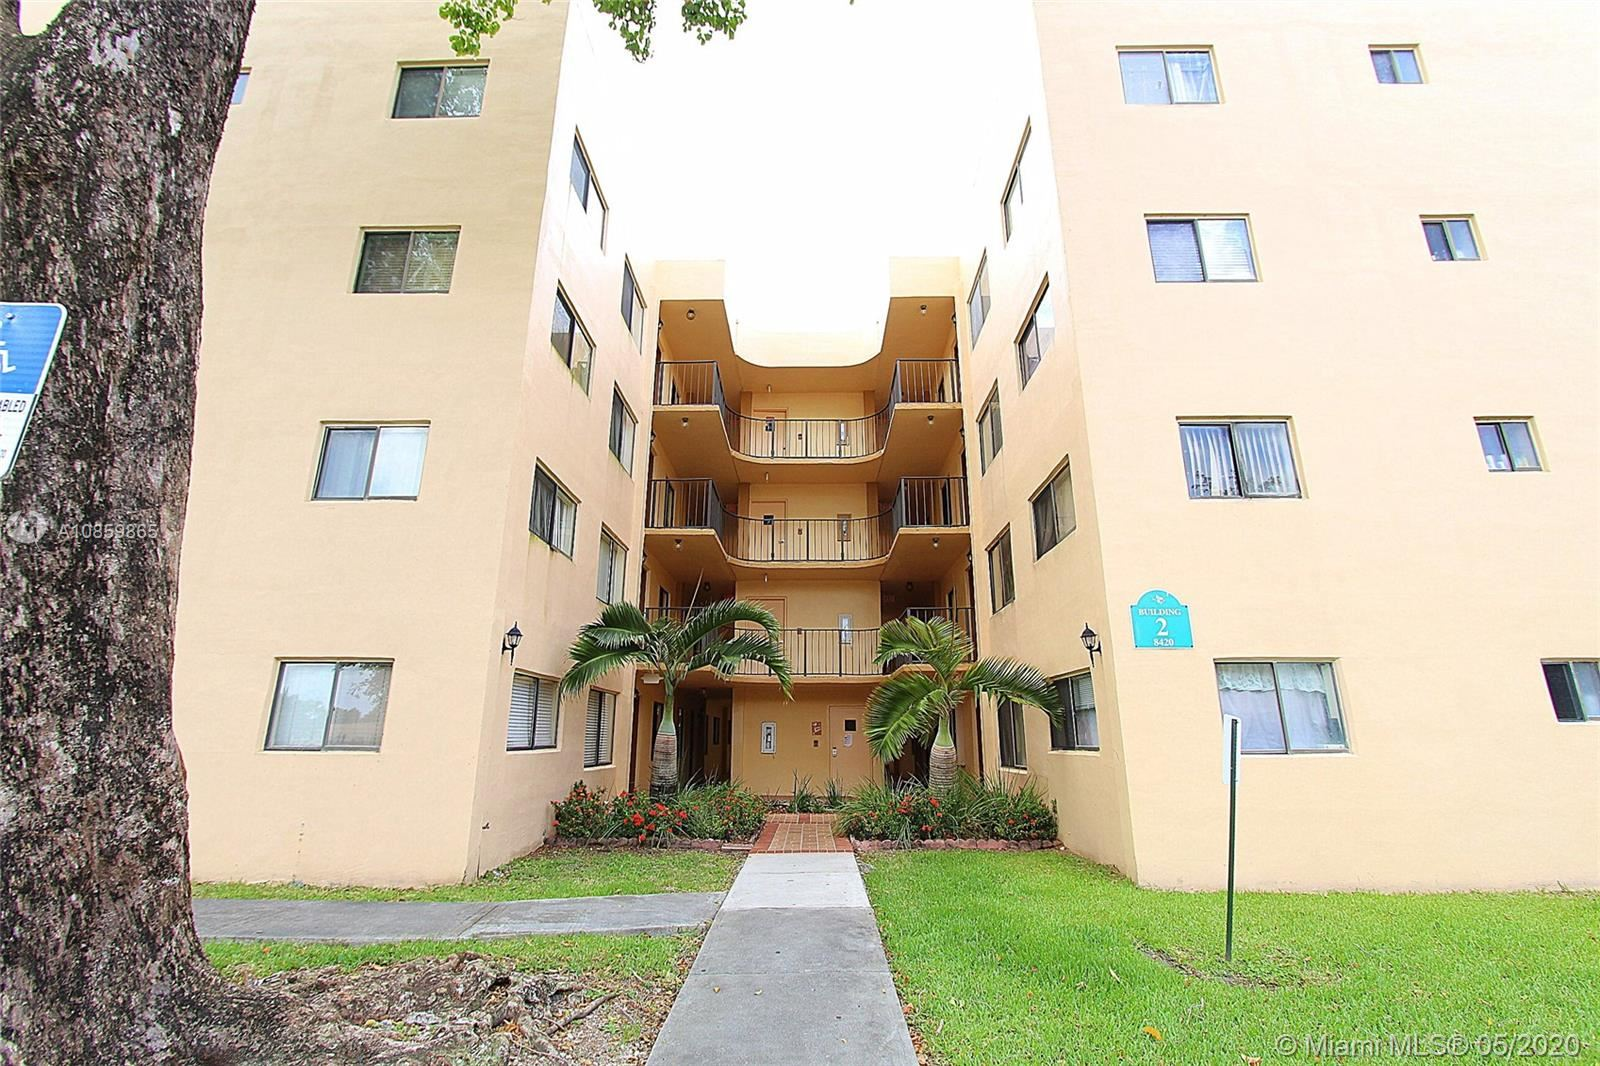 8420 SW 133rd Ave Rd #302, Miami, FL 33183 - #: A10859865